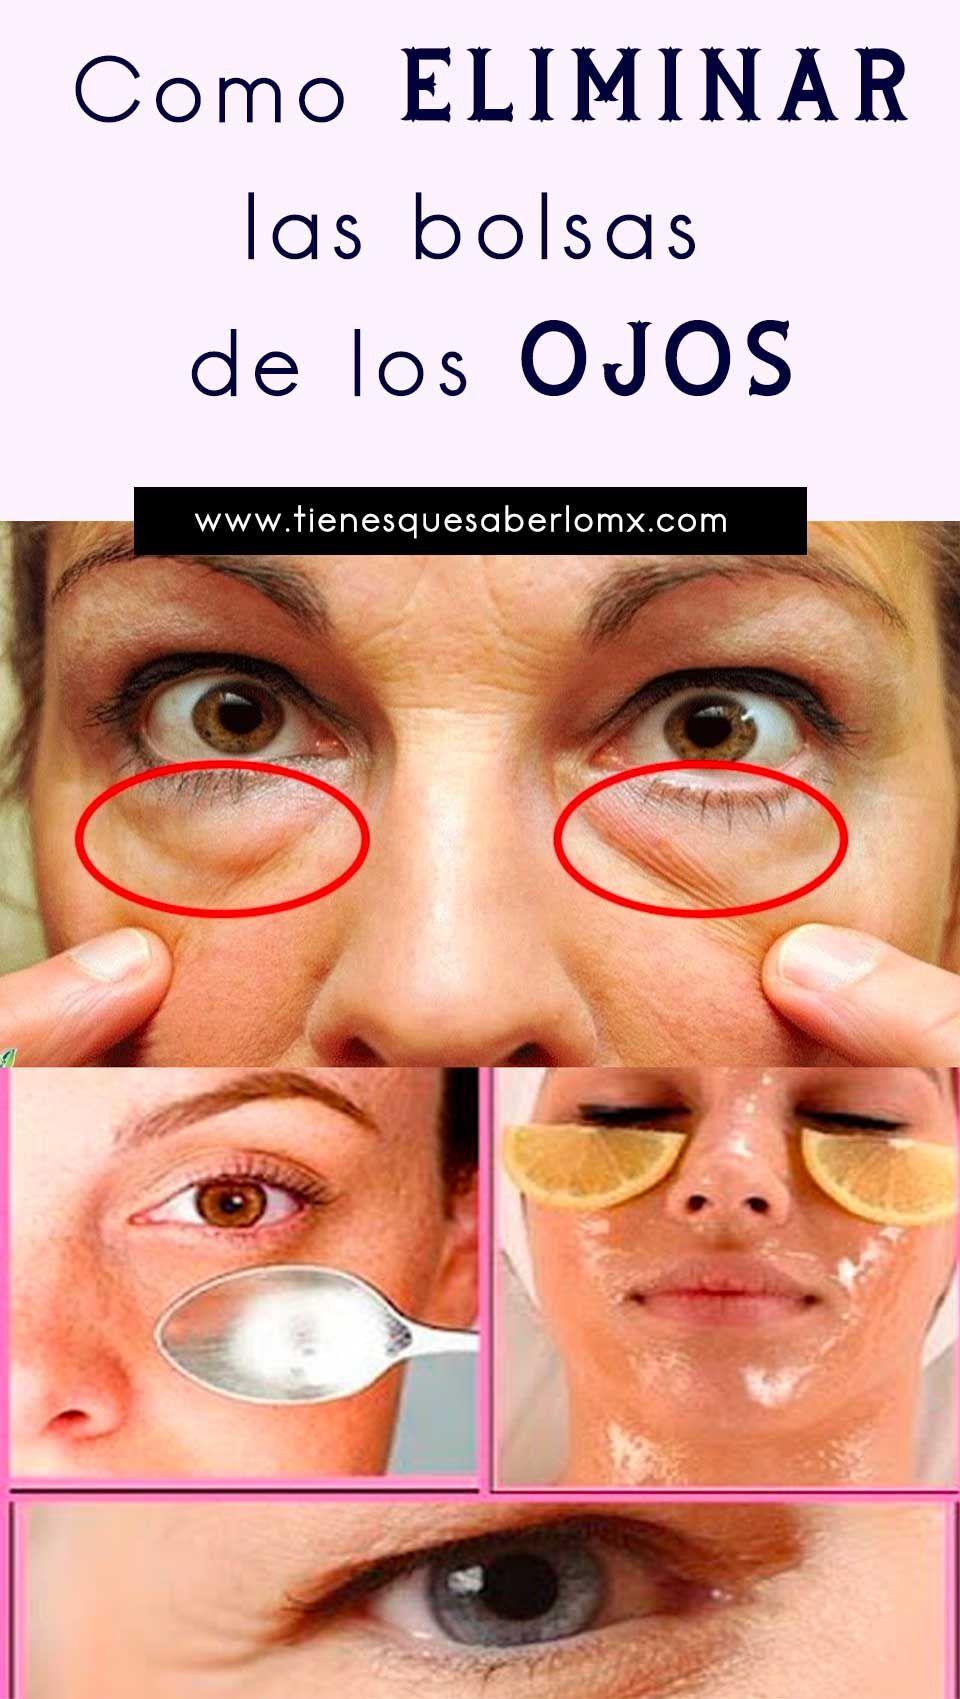 Como eliminar las bolsas delos ojos | Bolsas de ojos